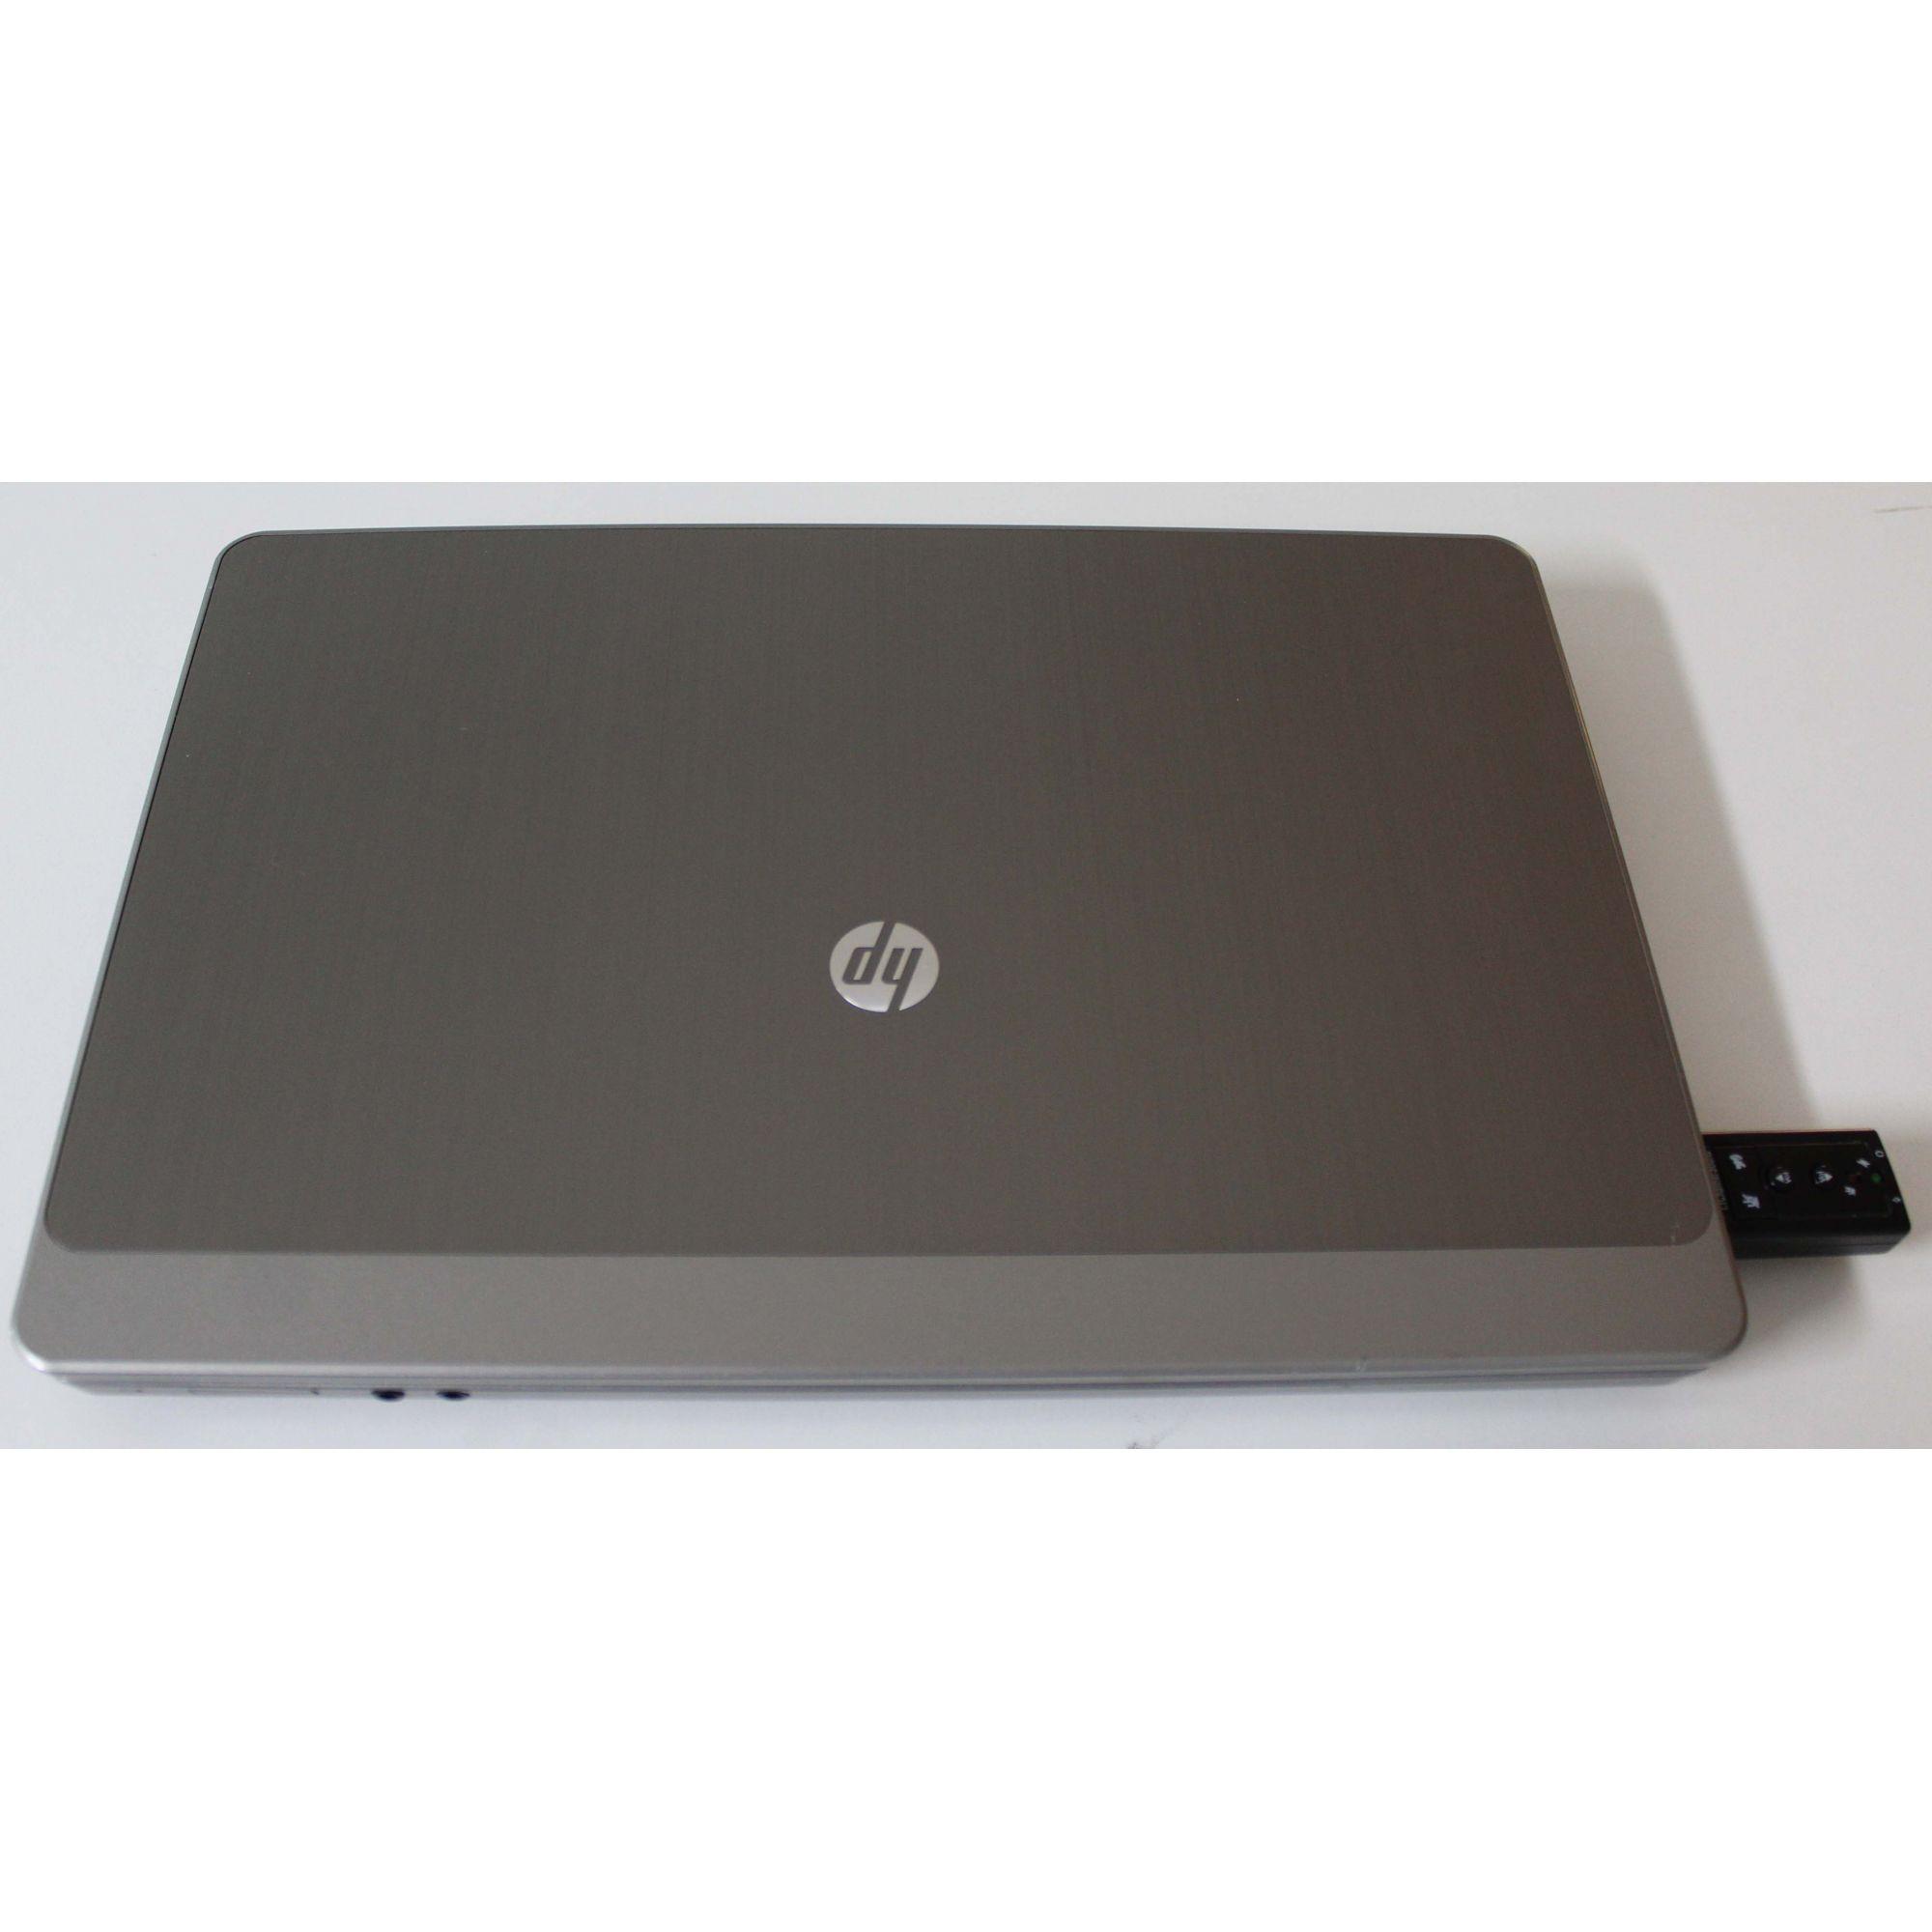 Notebook HP Probook 4430s 14'' Intel Core i5 2.3GHz 4GB HD-500GB